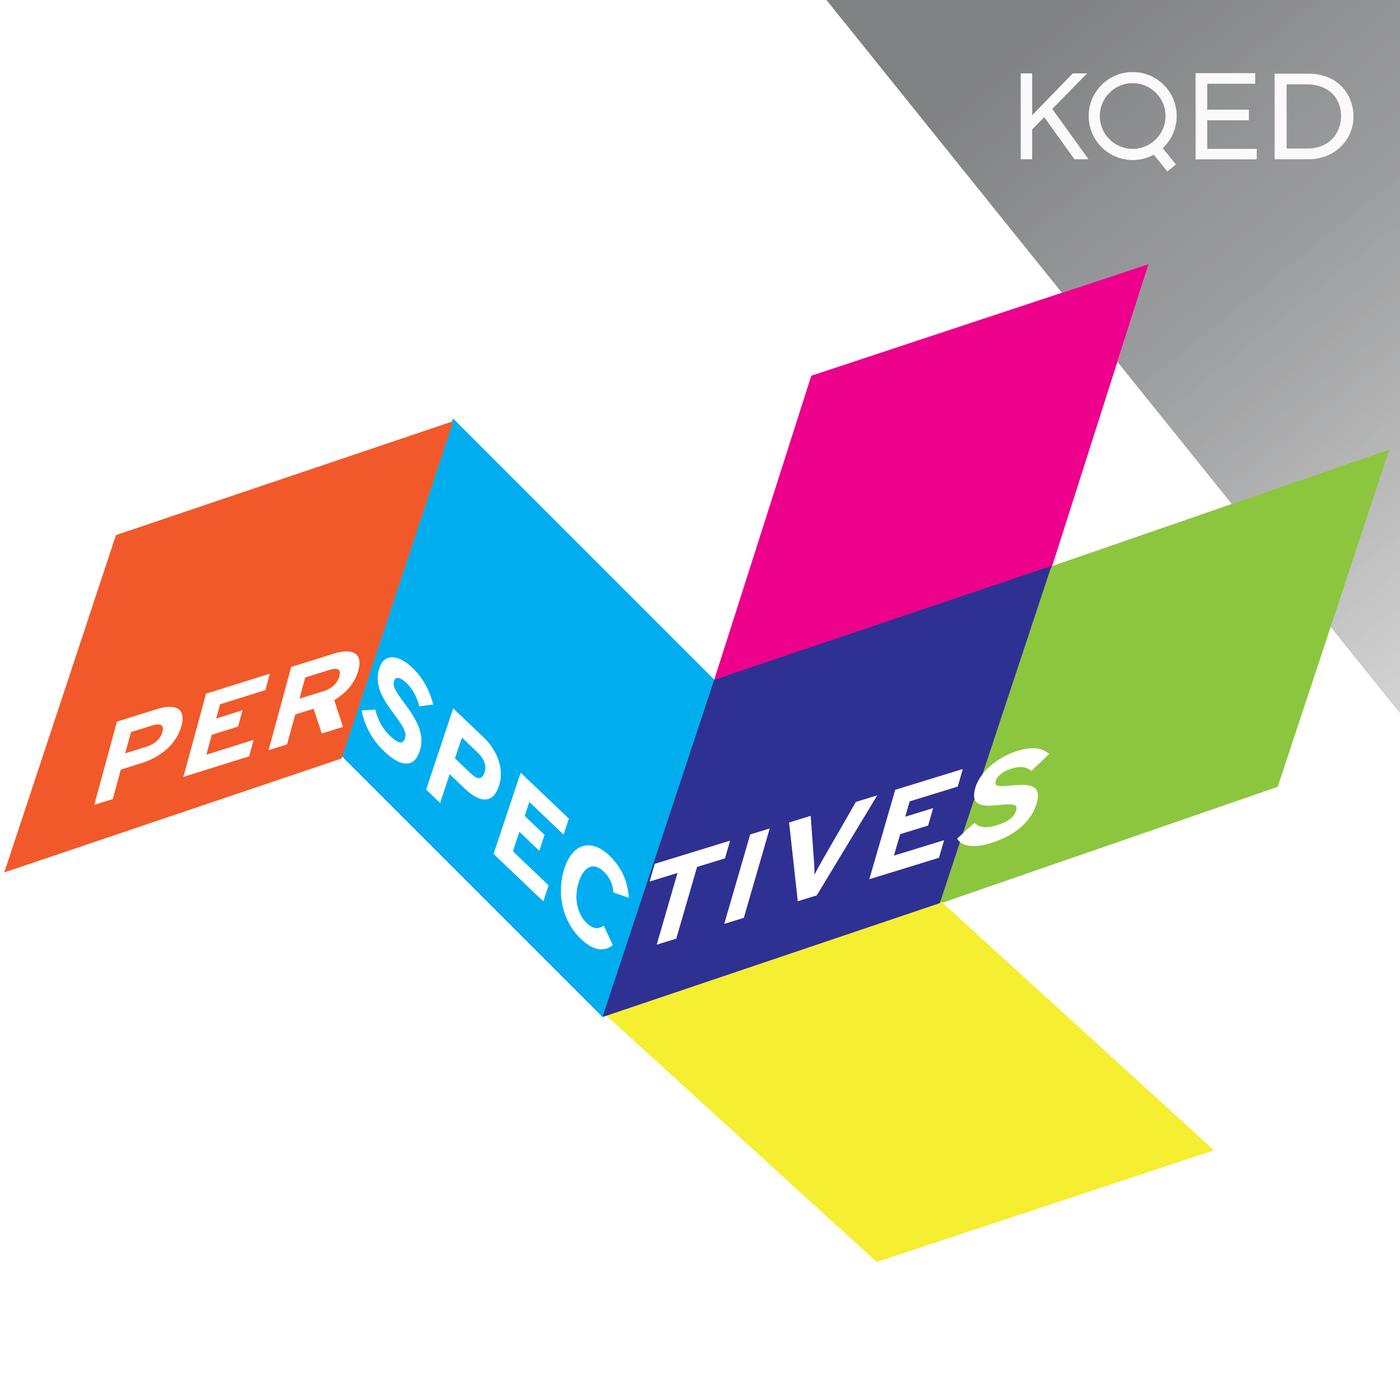 Perspectives : NPR